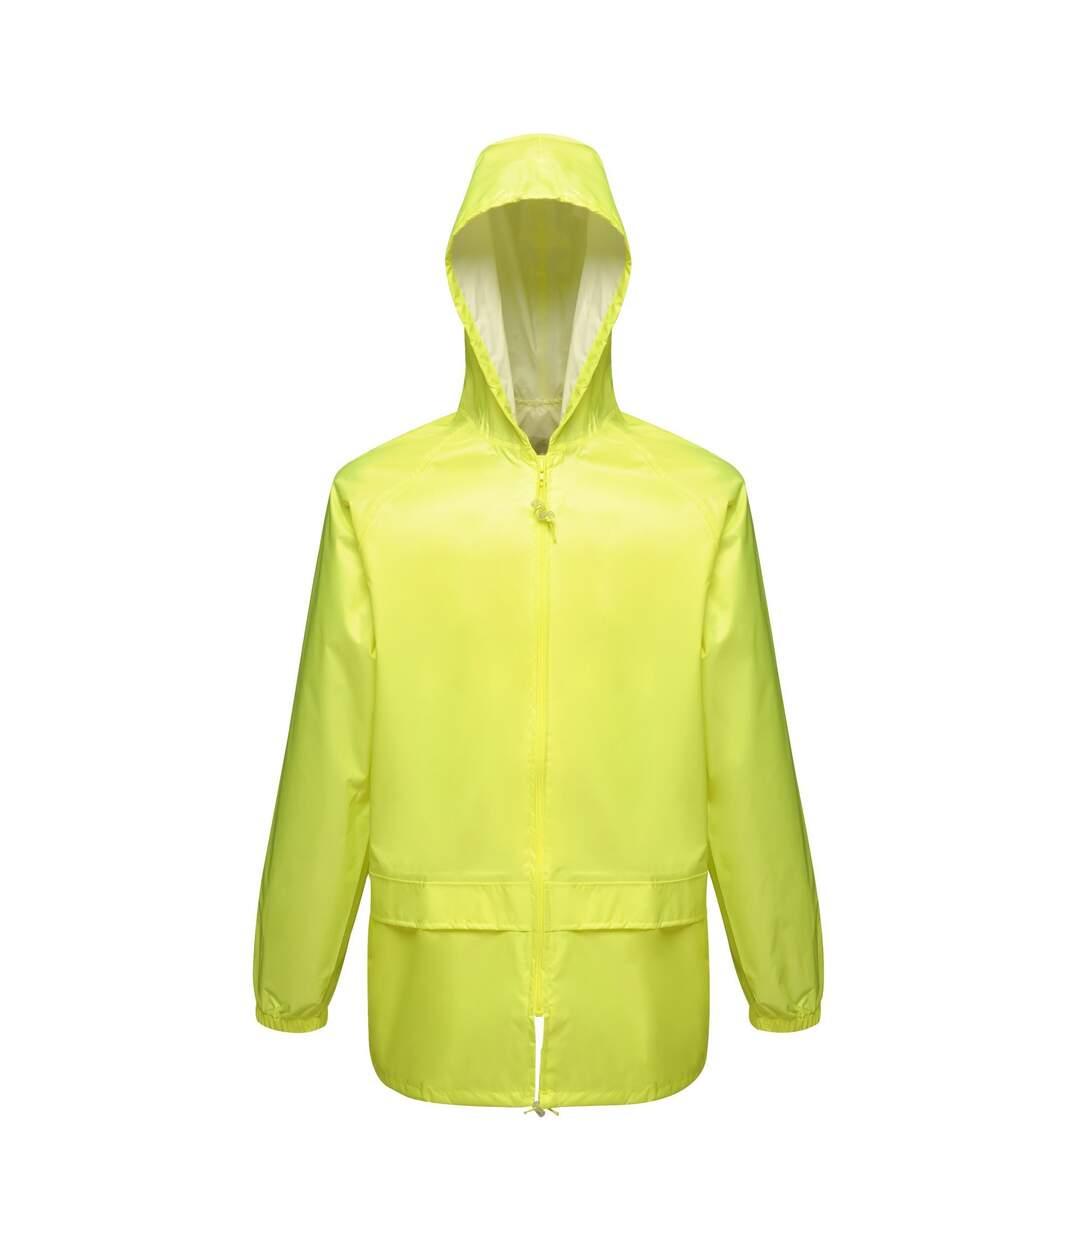 Regatta Professional Mens Pro Stormbreaker Waterproof Jacket (Black) - UTRG2376